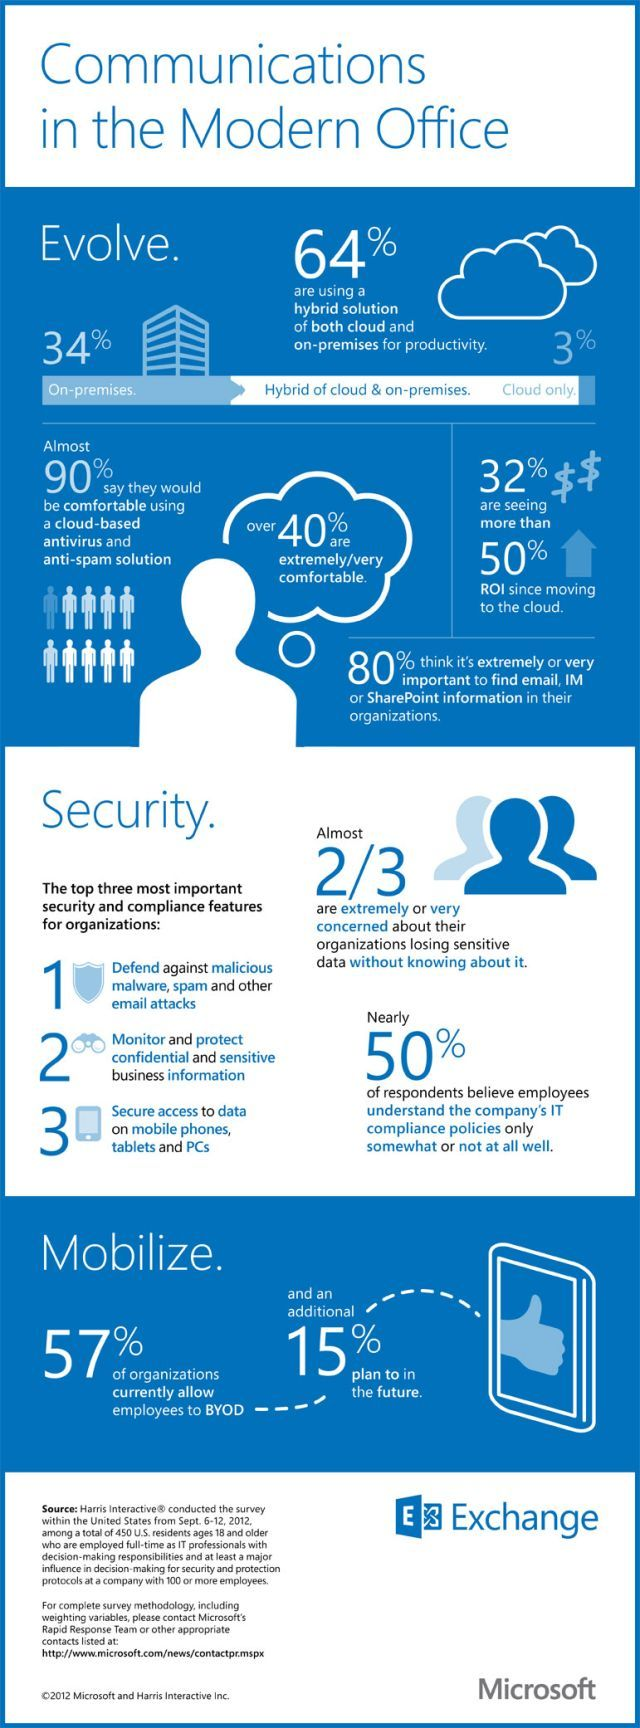 Microsoft infographic tool